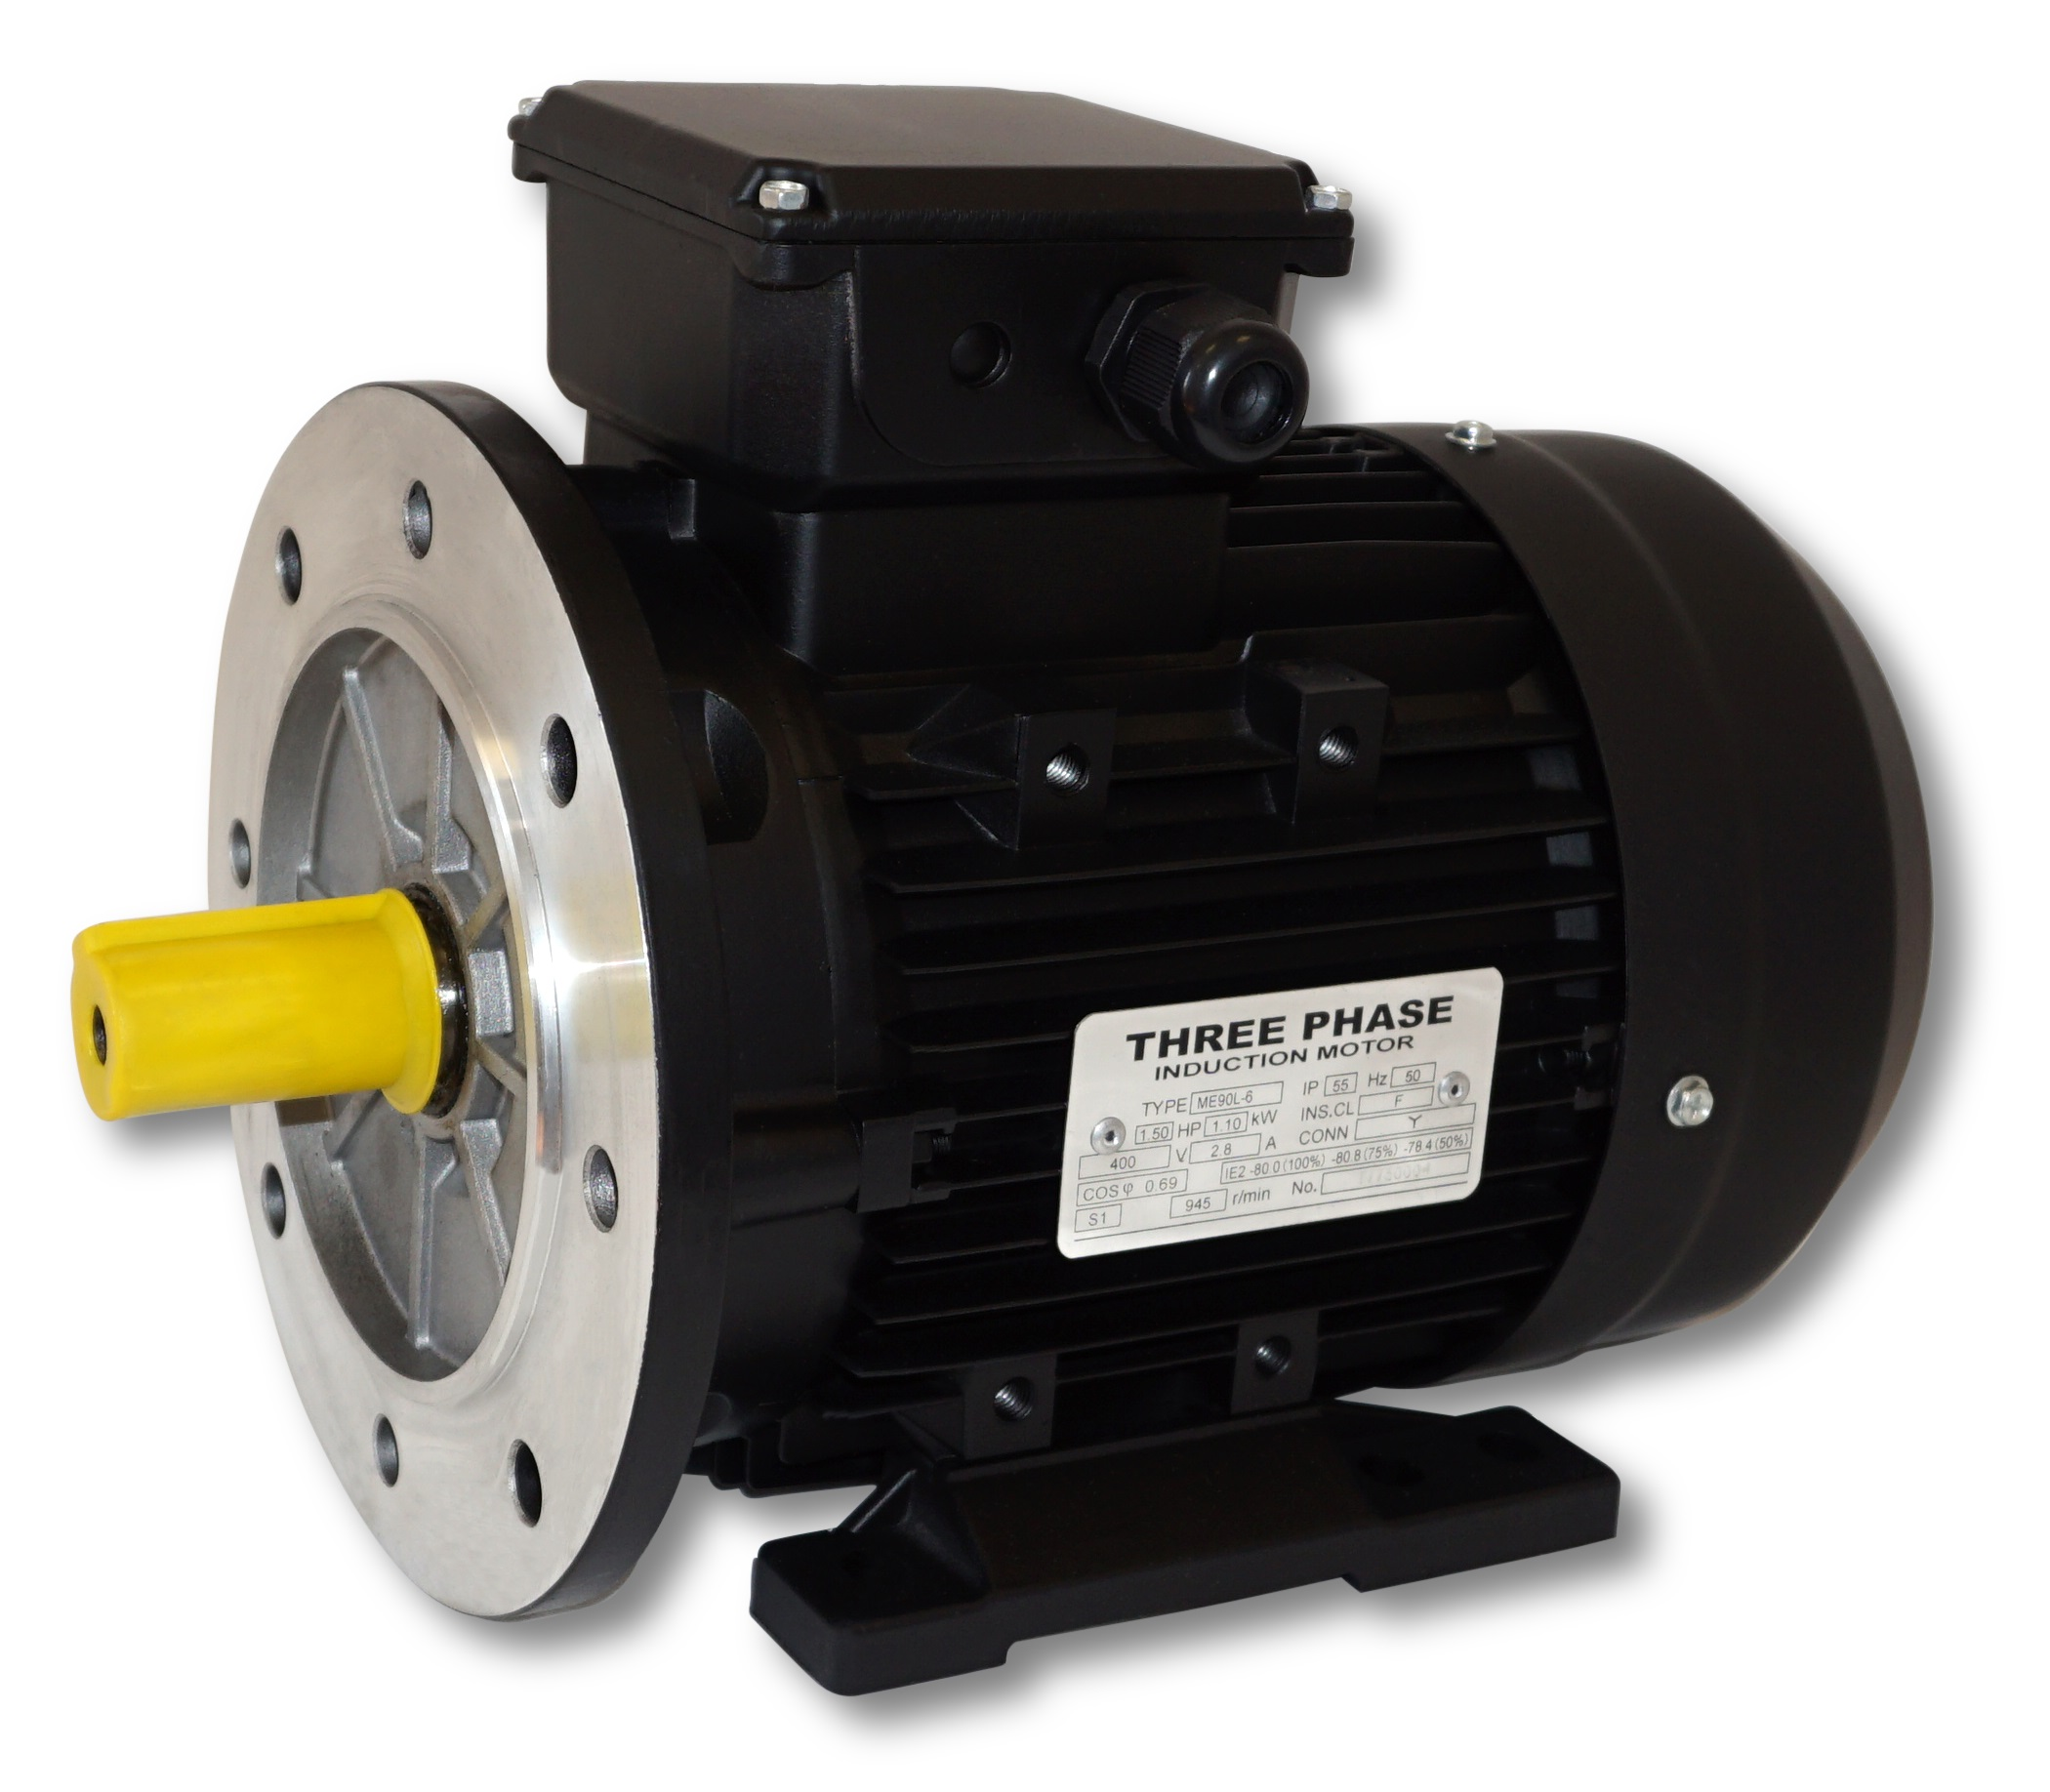 Servomotor mit Vergrabenen Magneten; IPM -Servomotor; Motor mit hohem LD/LQ